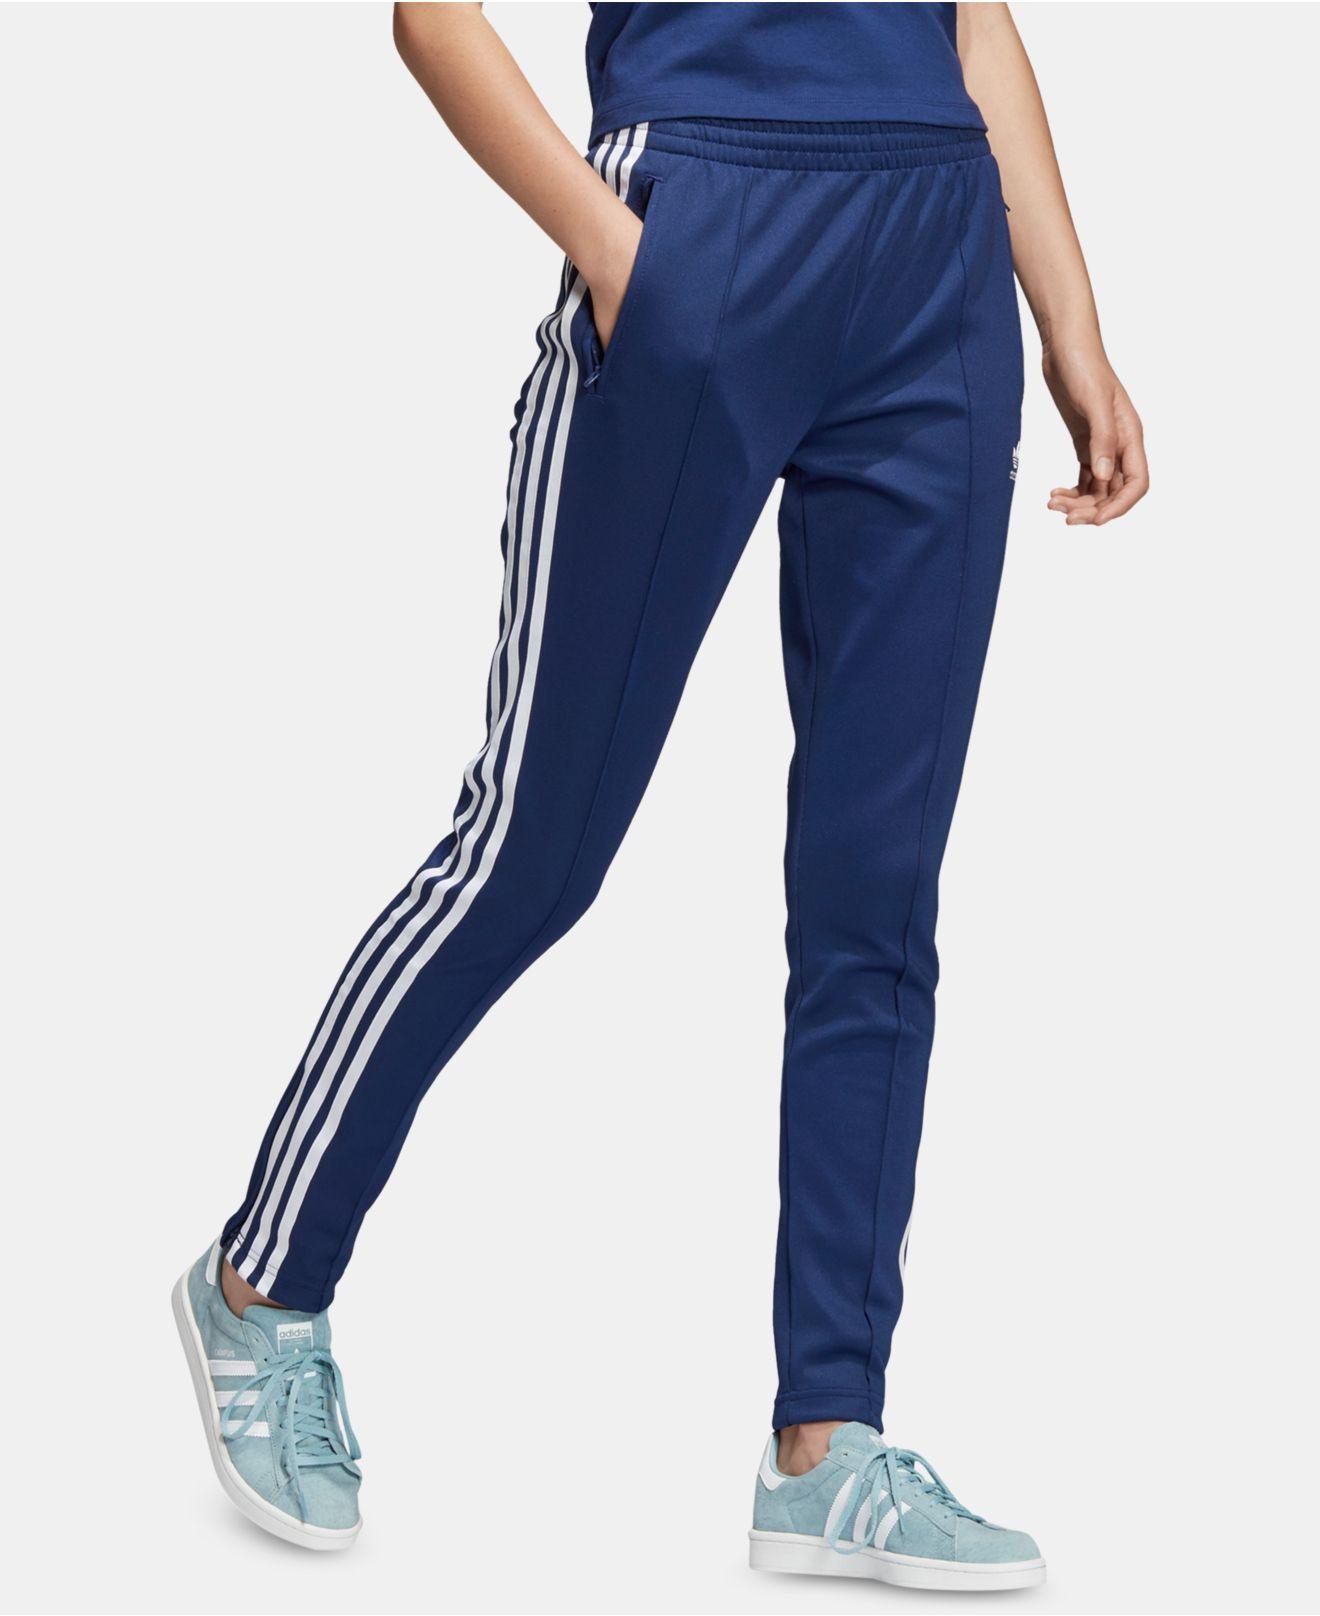 dd7b000b163 Lyst - adidas Originals Adicolor Superstar Track Pants in Blue